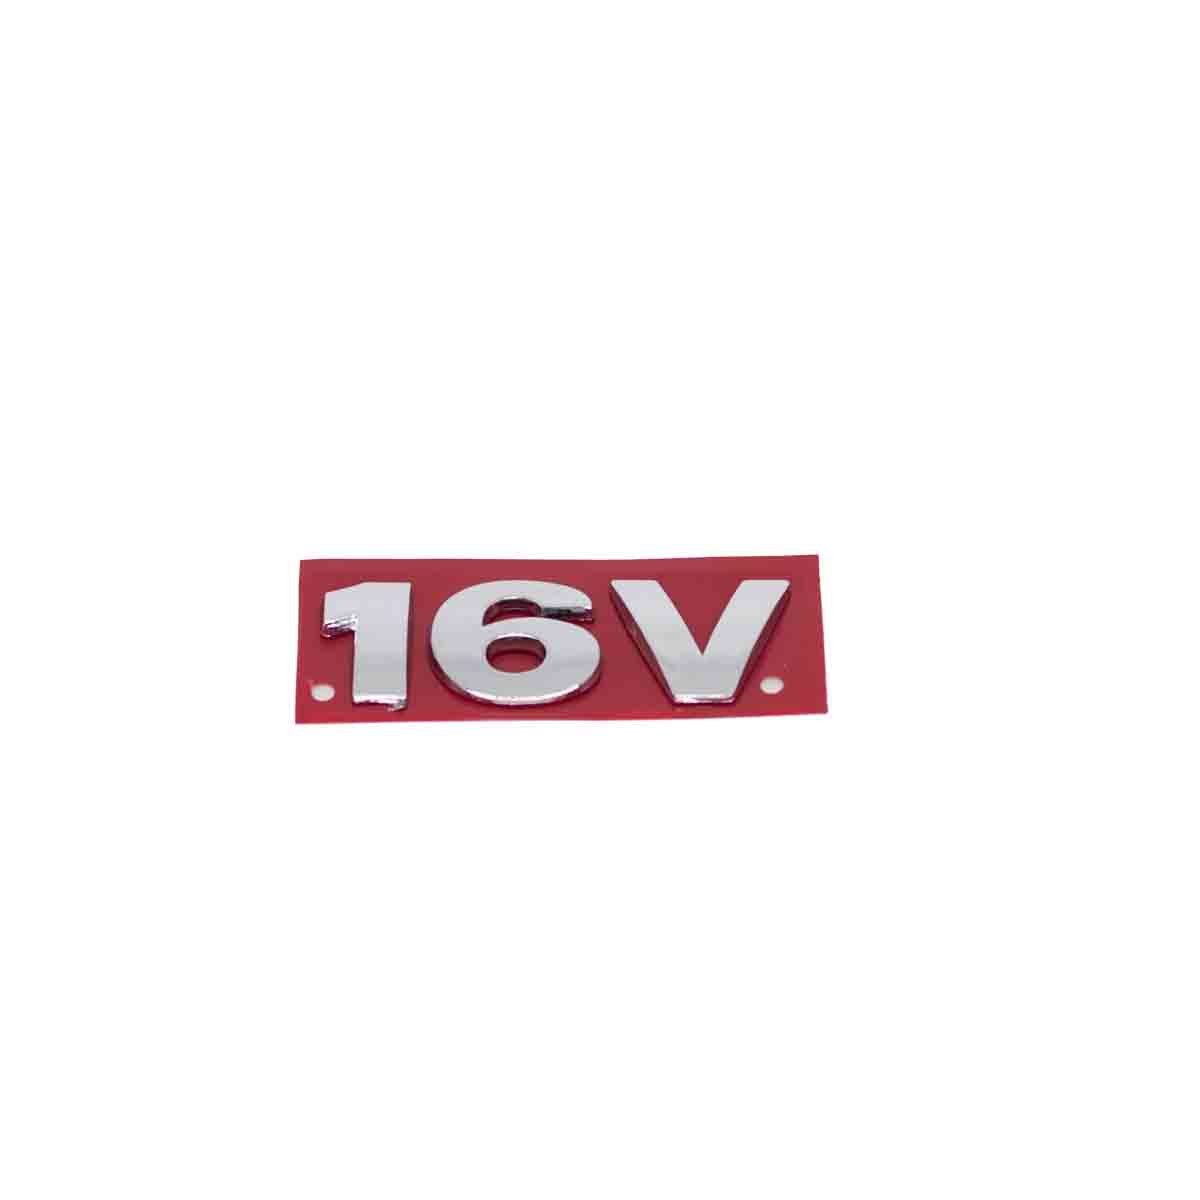 Emblema 16V VW Malas G3 Cromado